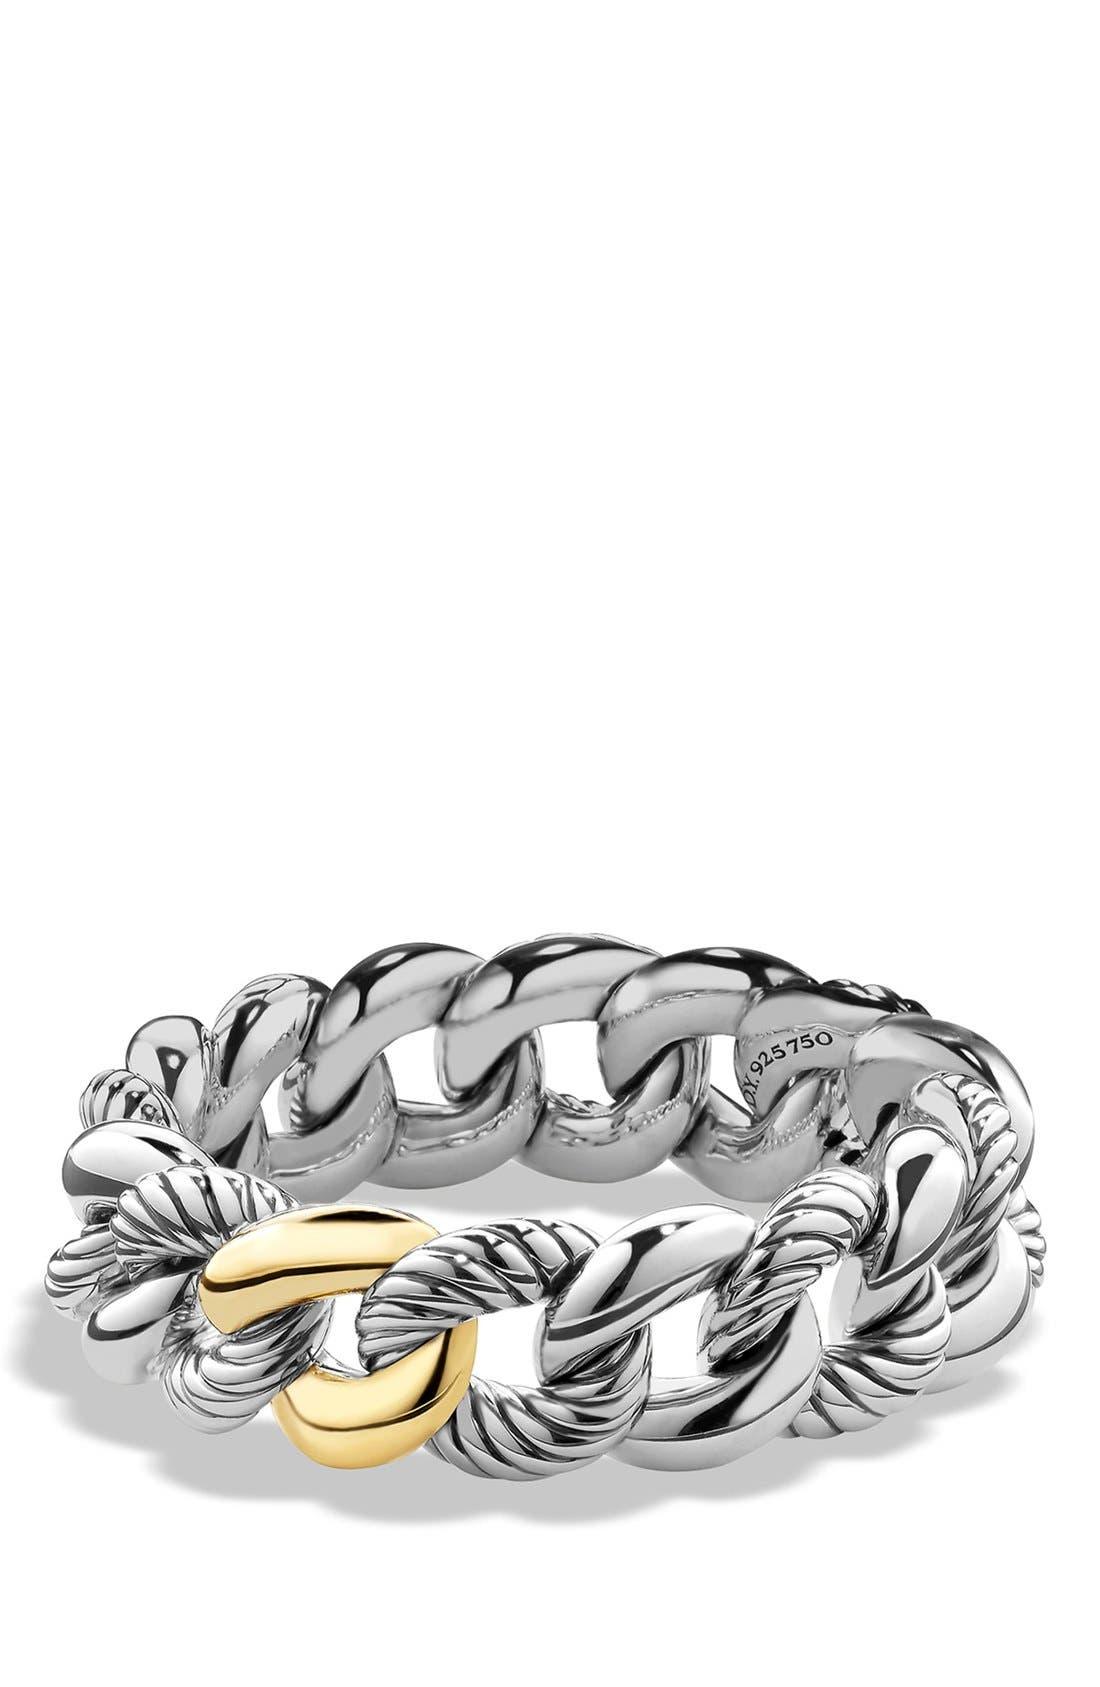 David Yurman'Belmont' Curb Link Bracelet with 18K Gold